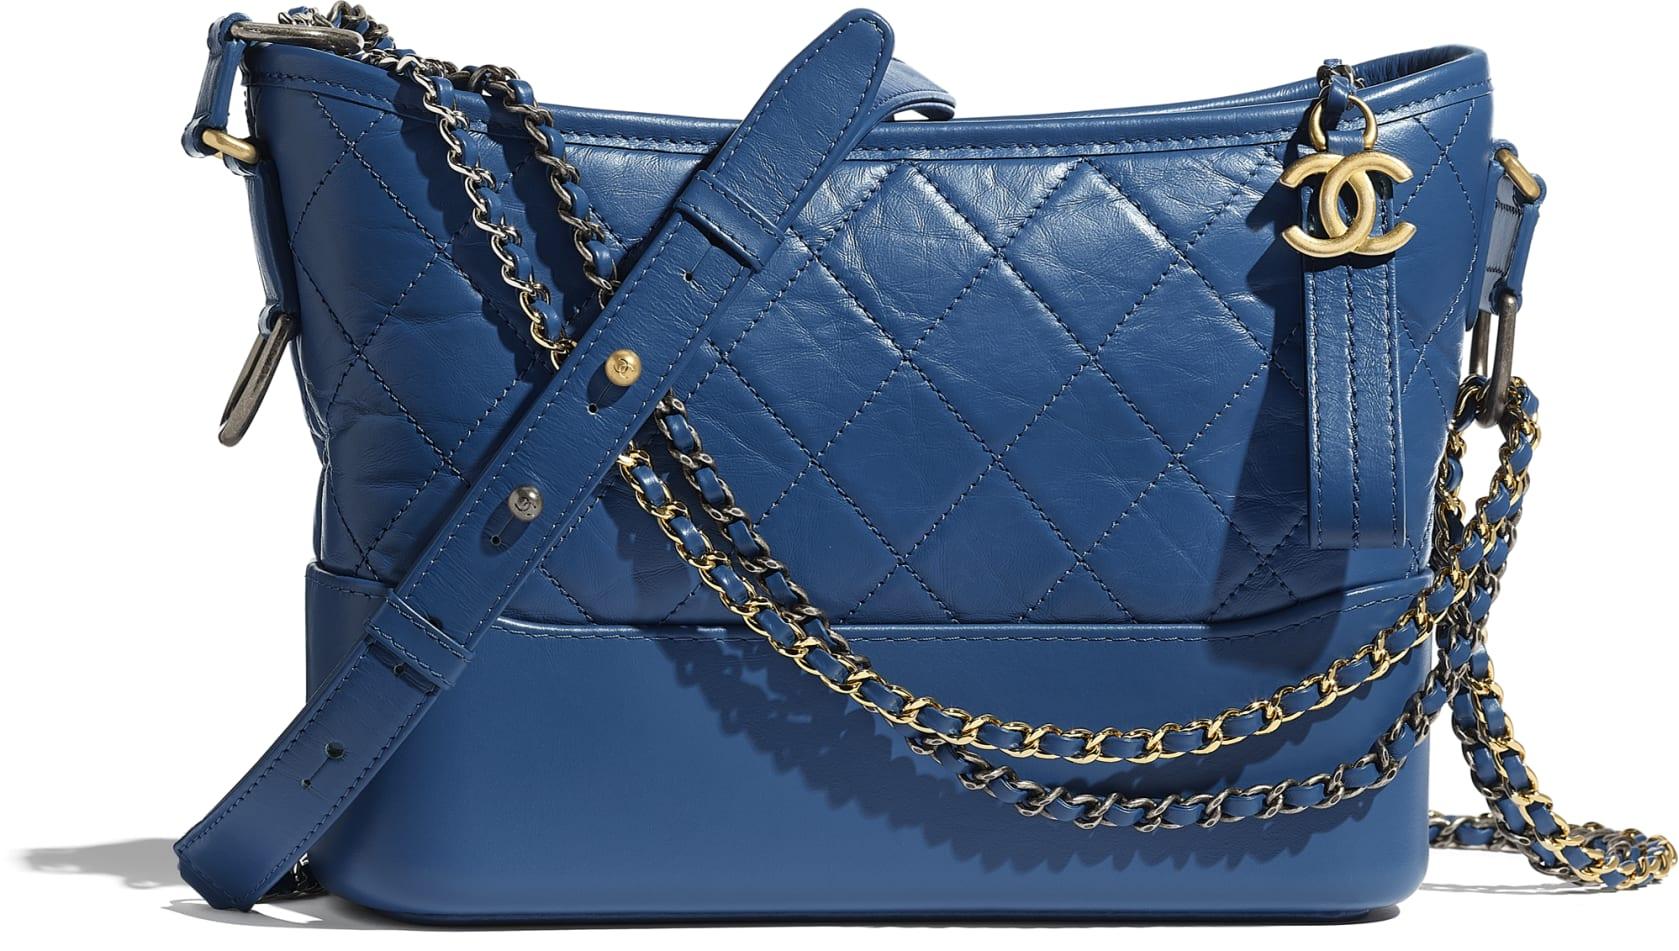 CHANEL'S GABRIELLE Hobo Handbag